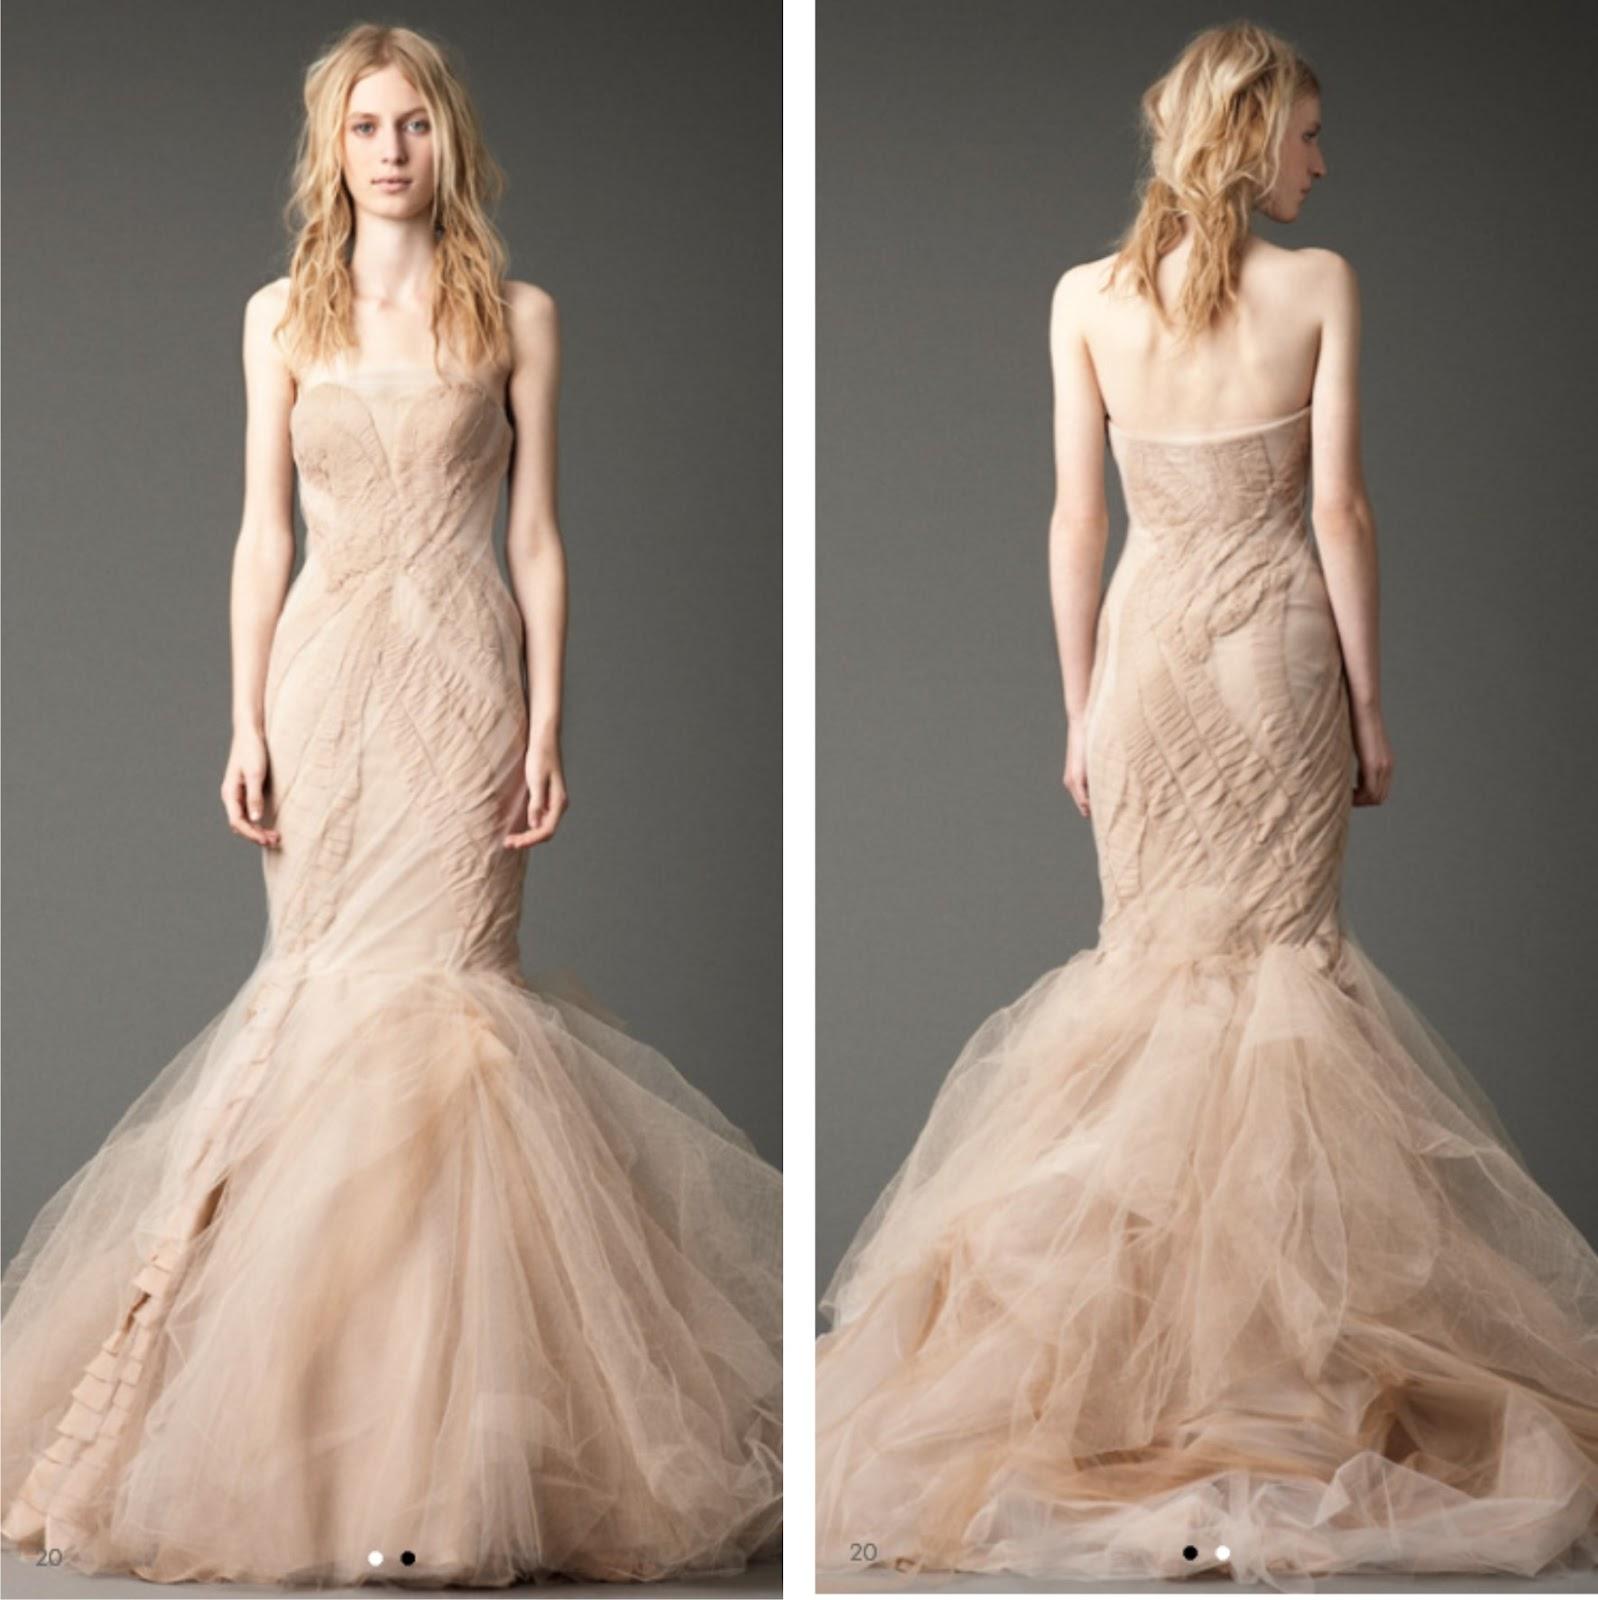 4bf4fe0be7 Barbie Doll Wedding Dress Atdisability